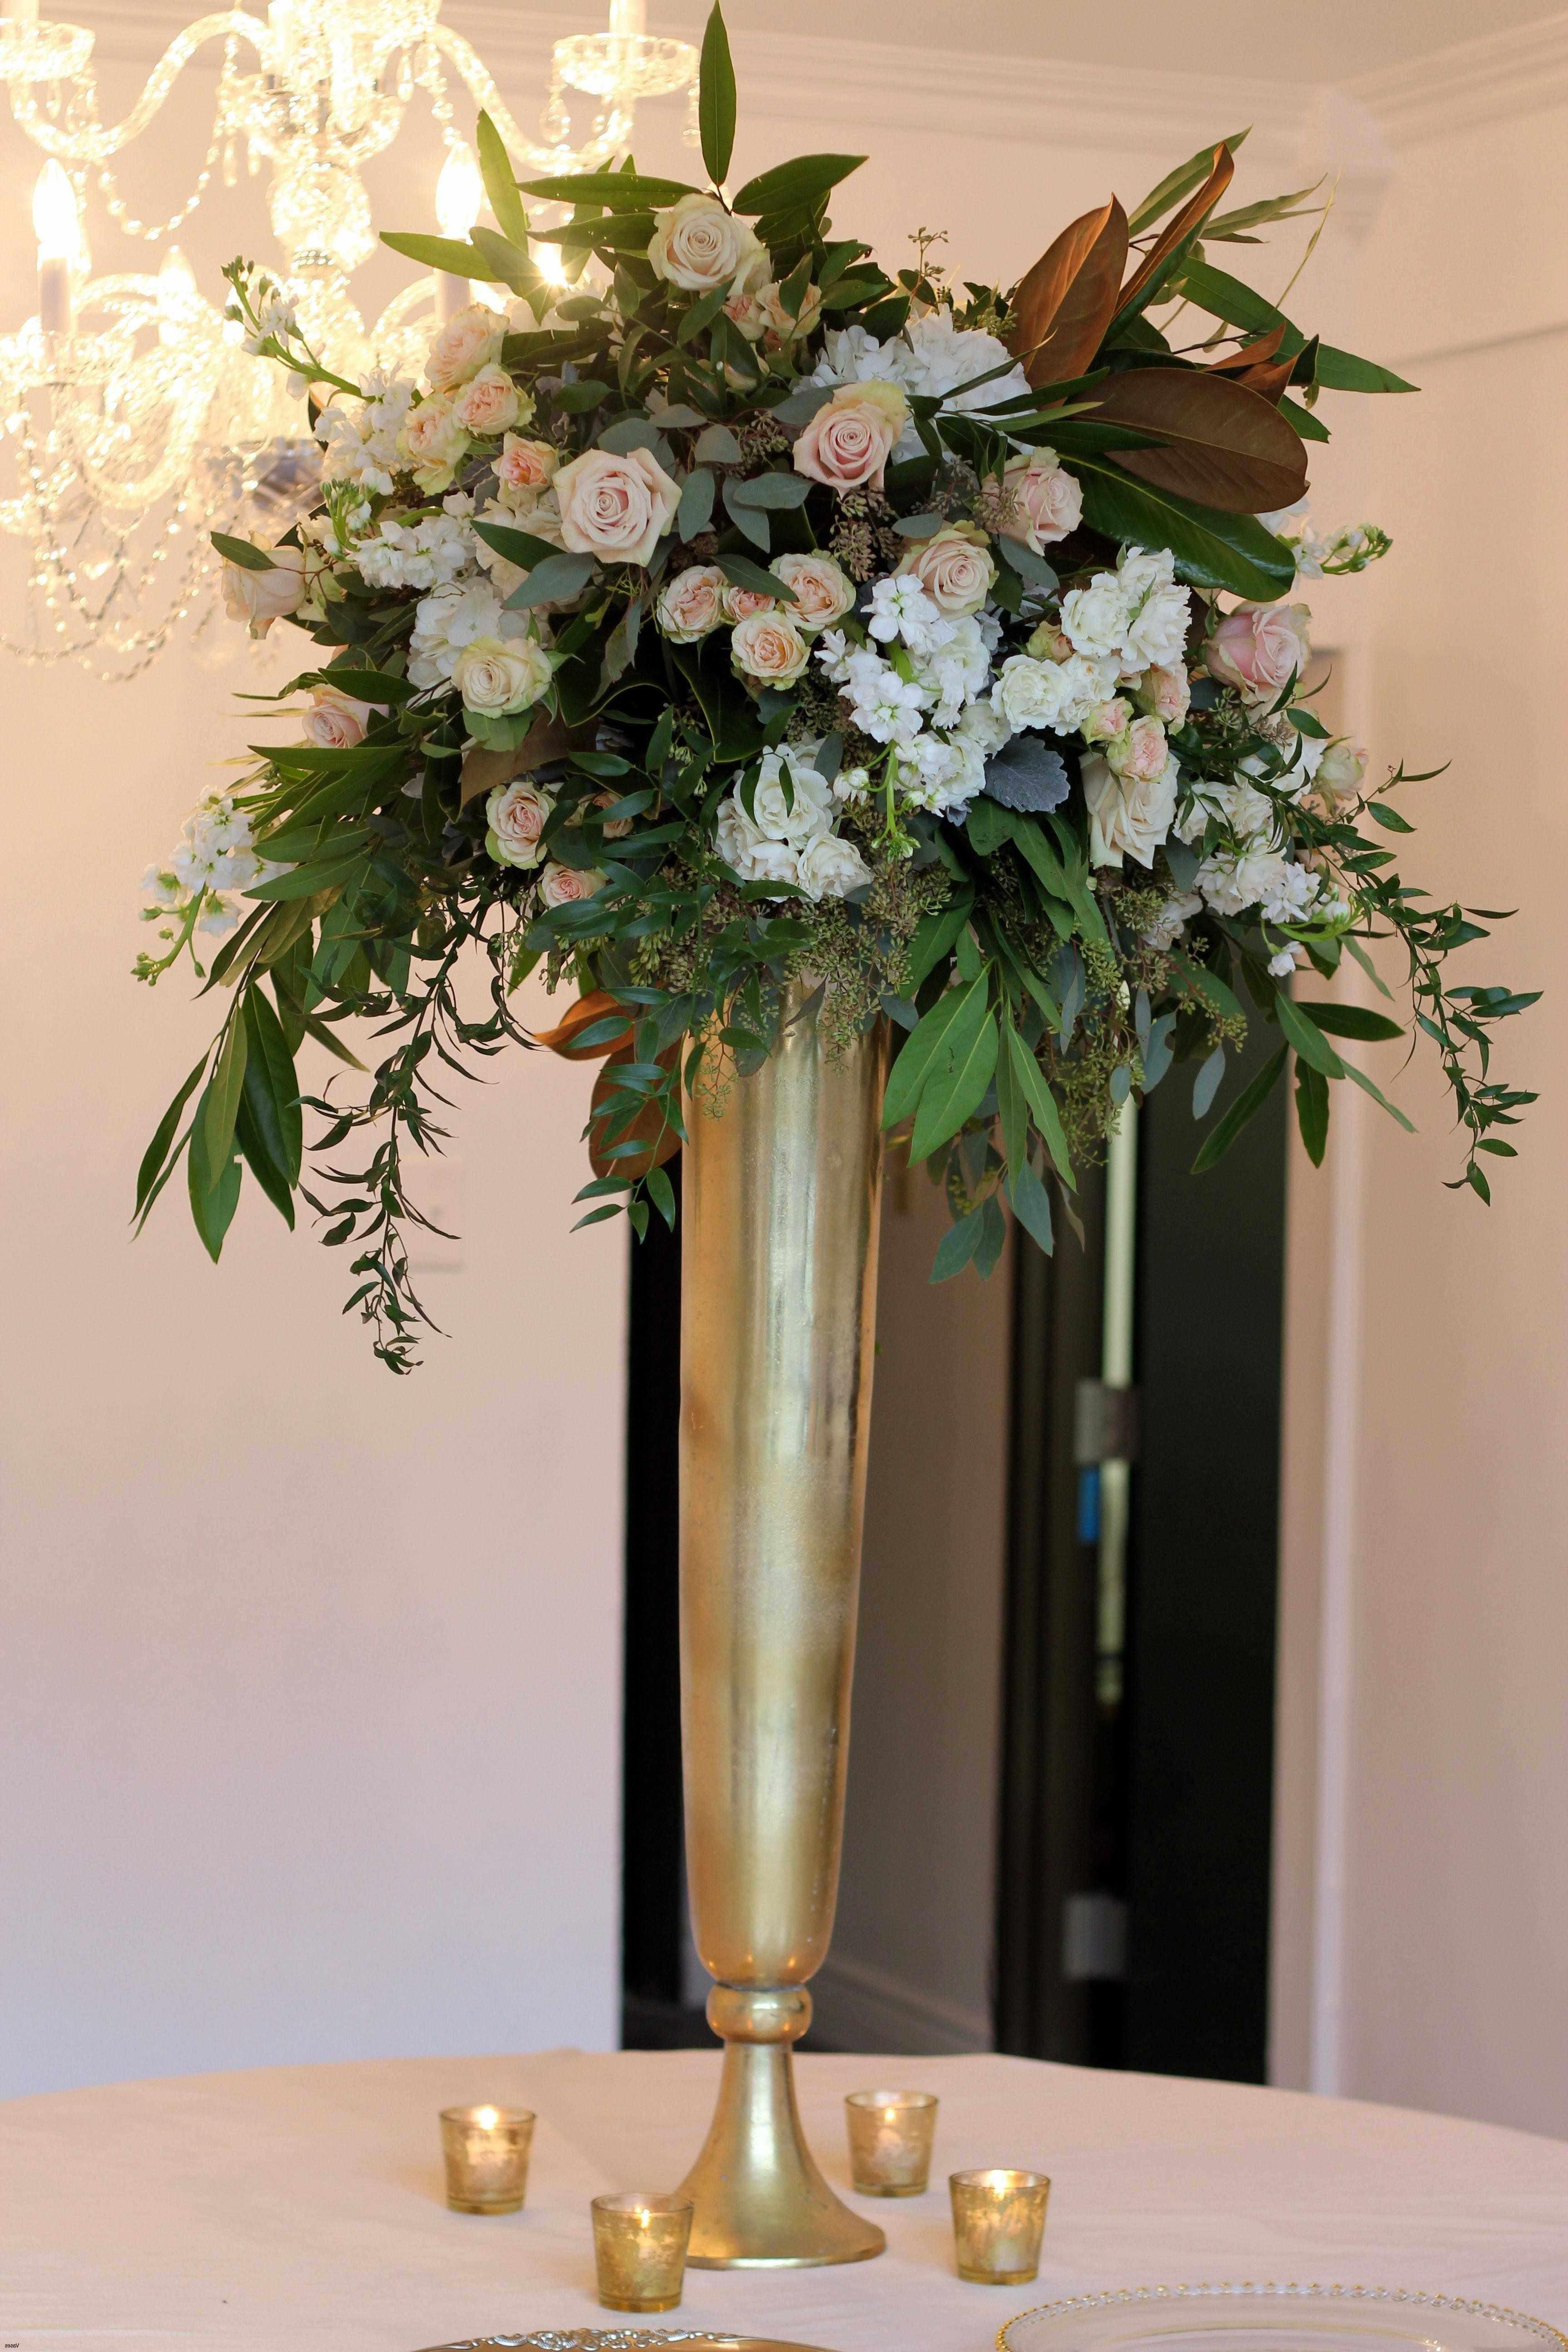 gold vases wholesale of 60 inspirational bulk wedding flowers a anna wedding for bulk wedding flowers new living room gold vases bulk luxury nautical centerpieceh vases of 60 inspirational